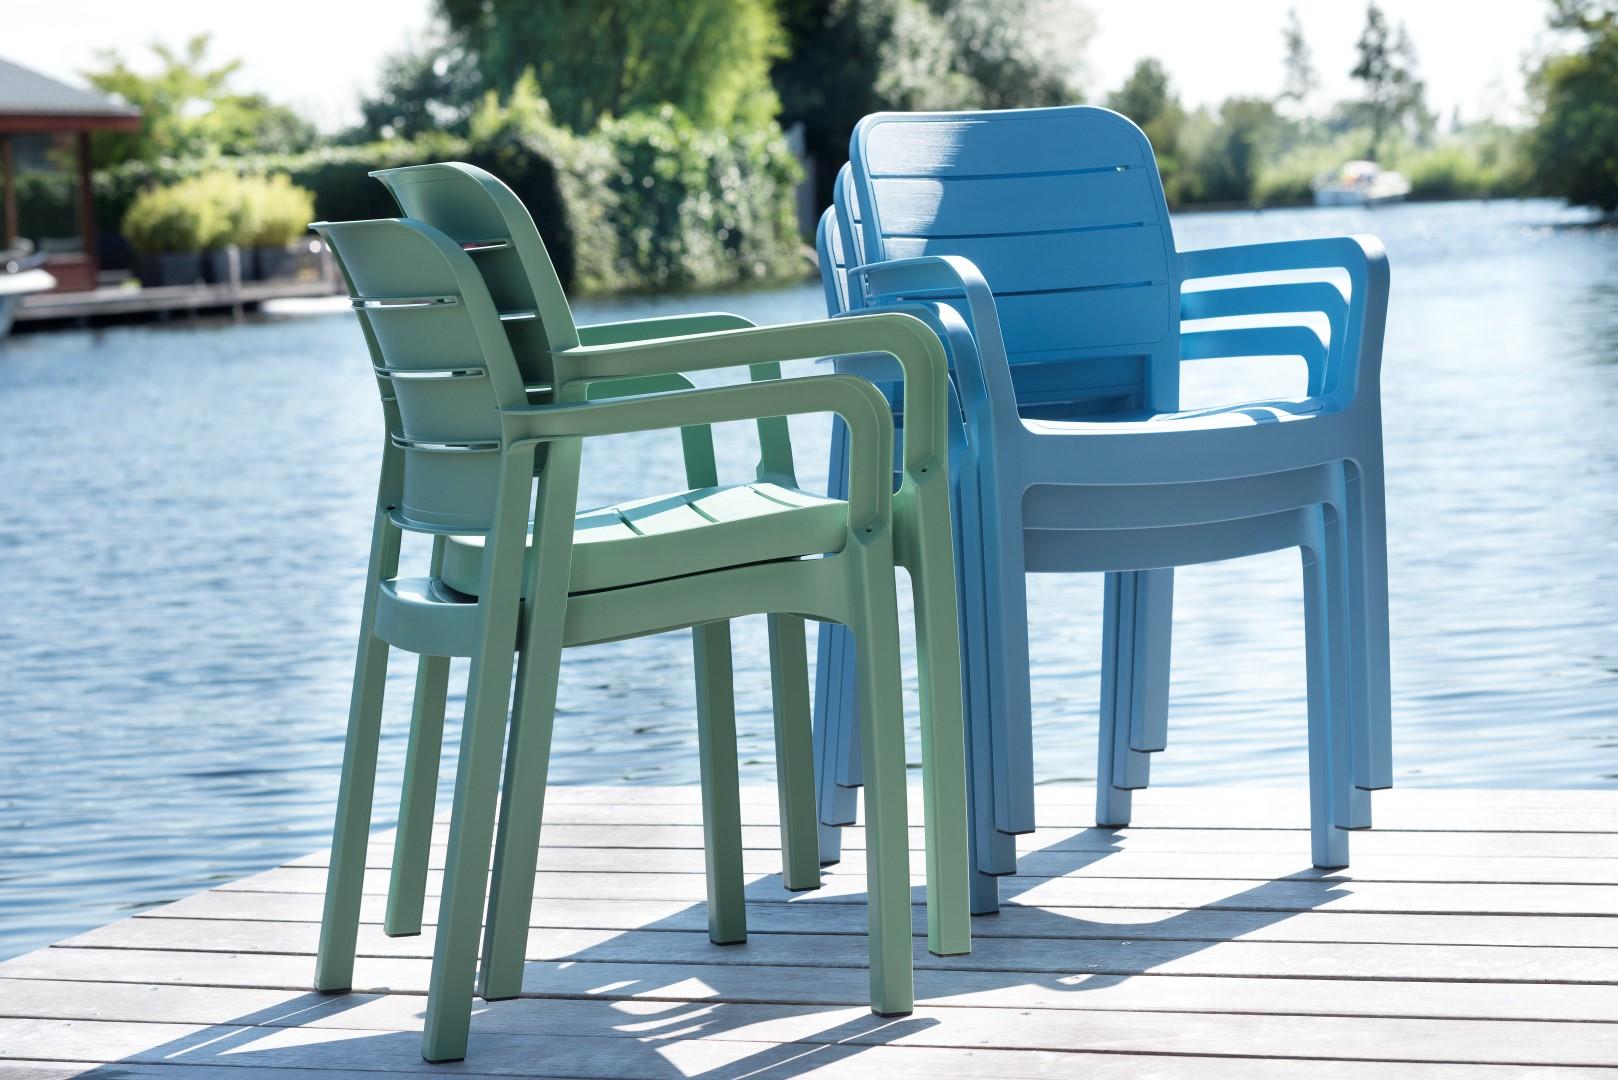 Tisara spring green and Summer blue stac